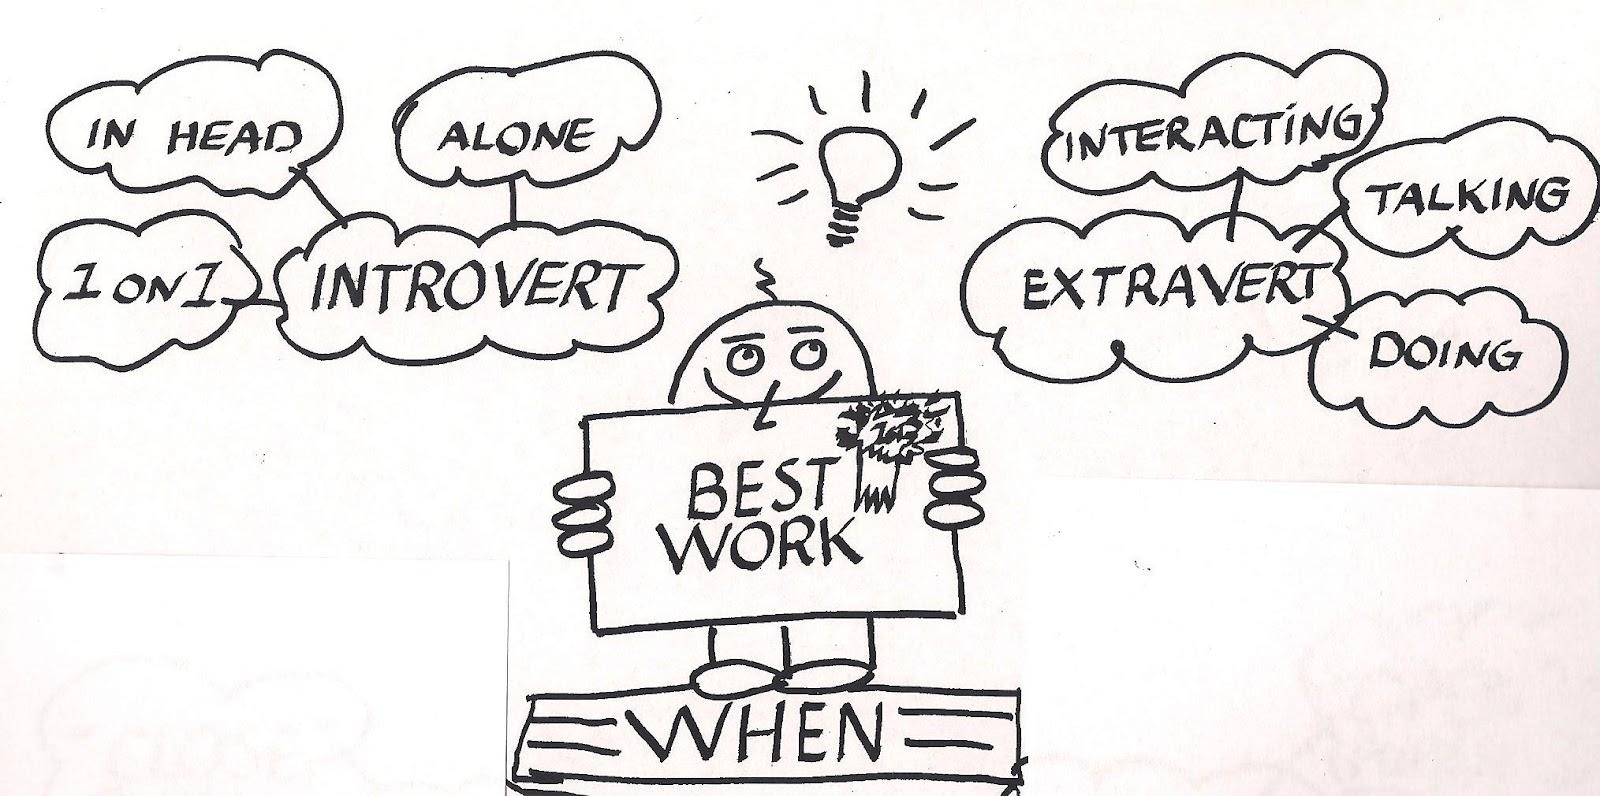 Extravert or Introvert? Best+work+introvert+and+extravert